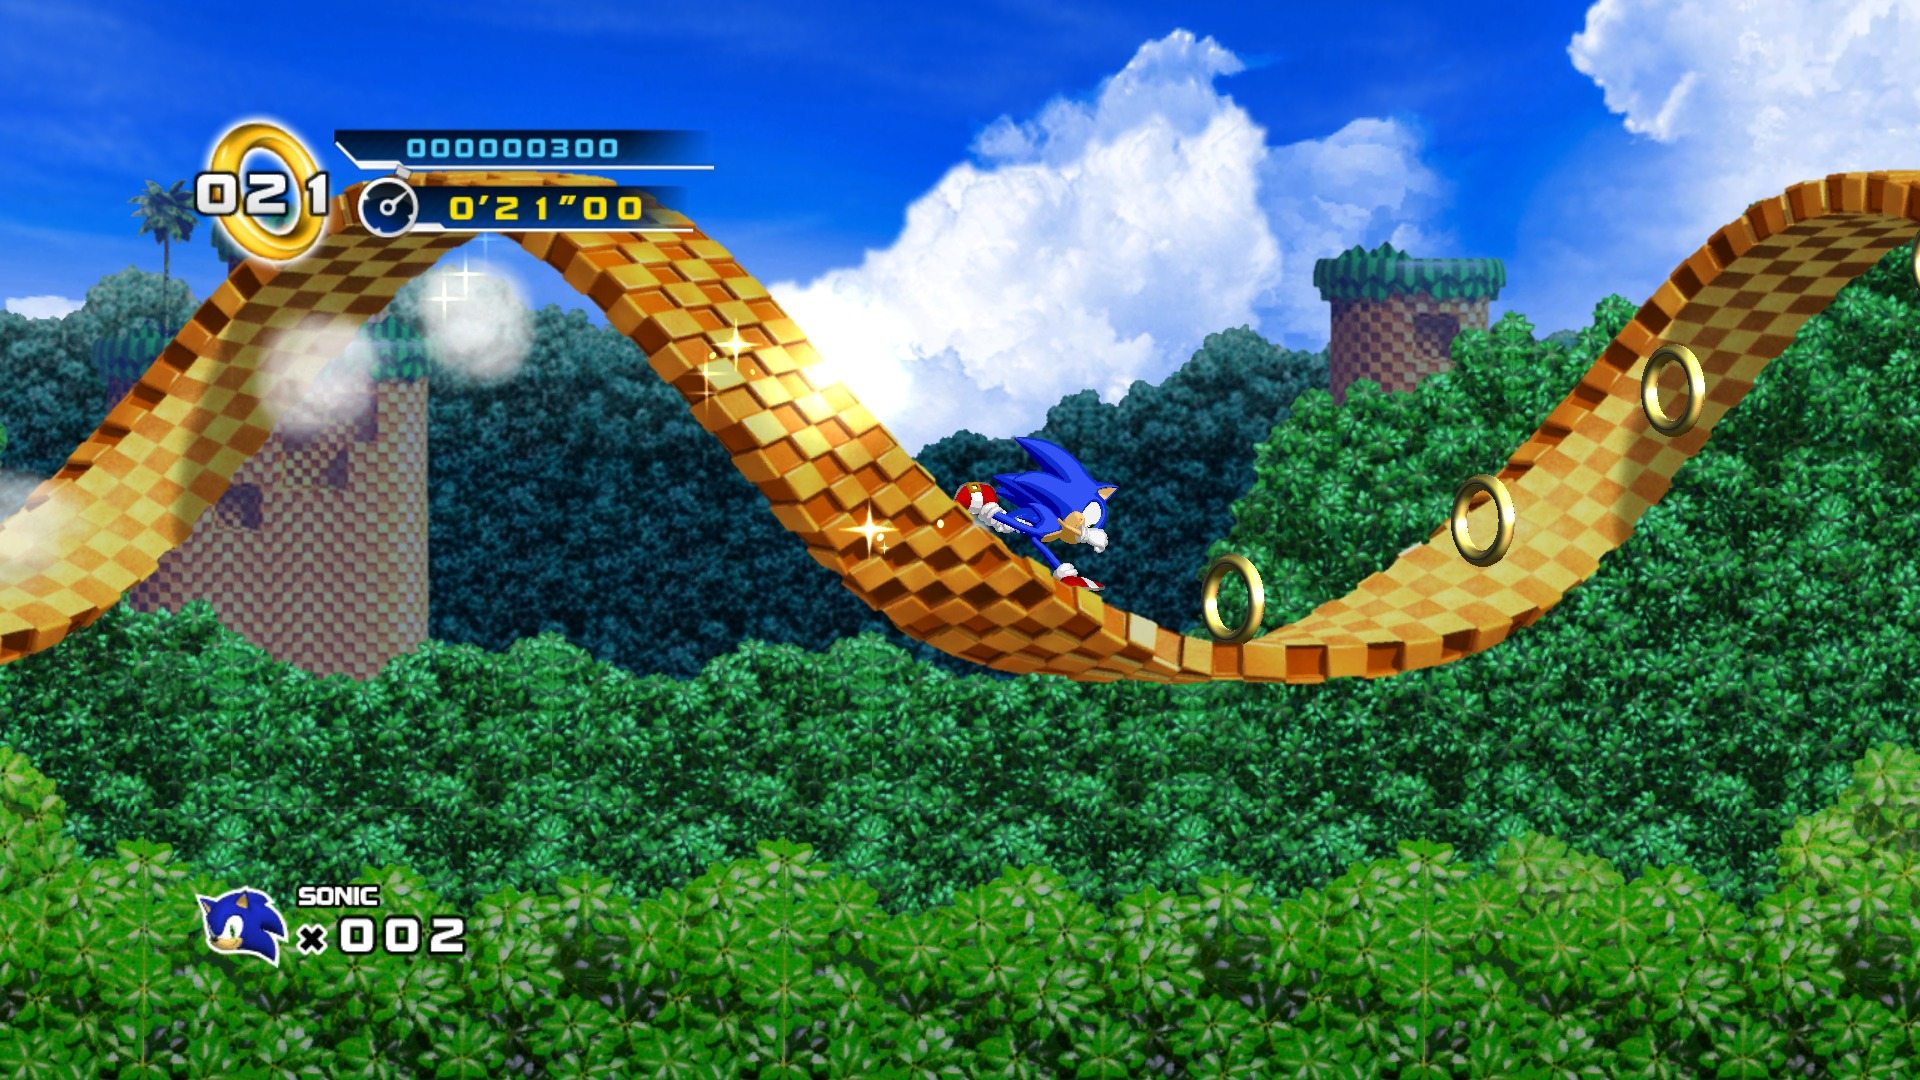 <b>Sonic</b> <b>The</b> <b>Hedgehog</b>: <b>Online</b> Gratis... | Gioca a Schermo Intero su Poki